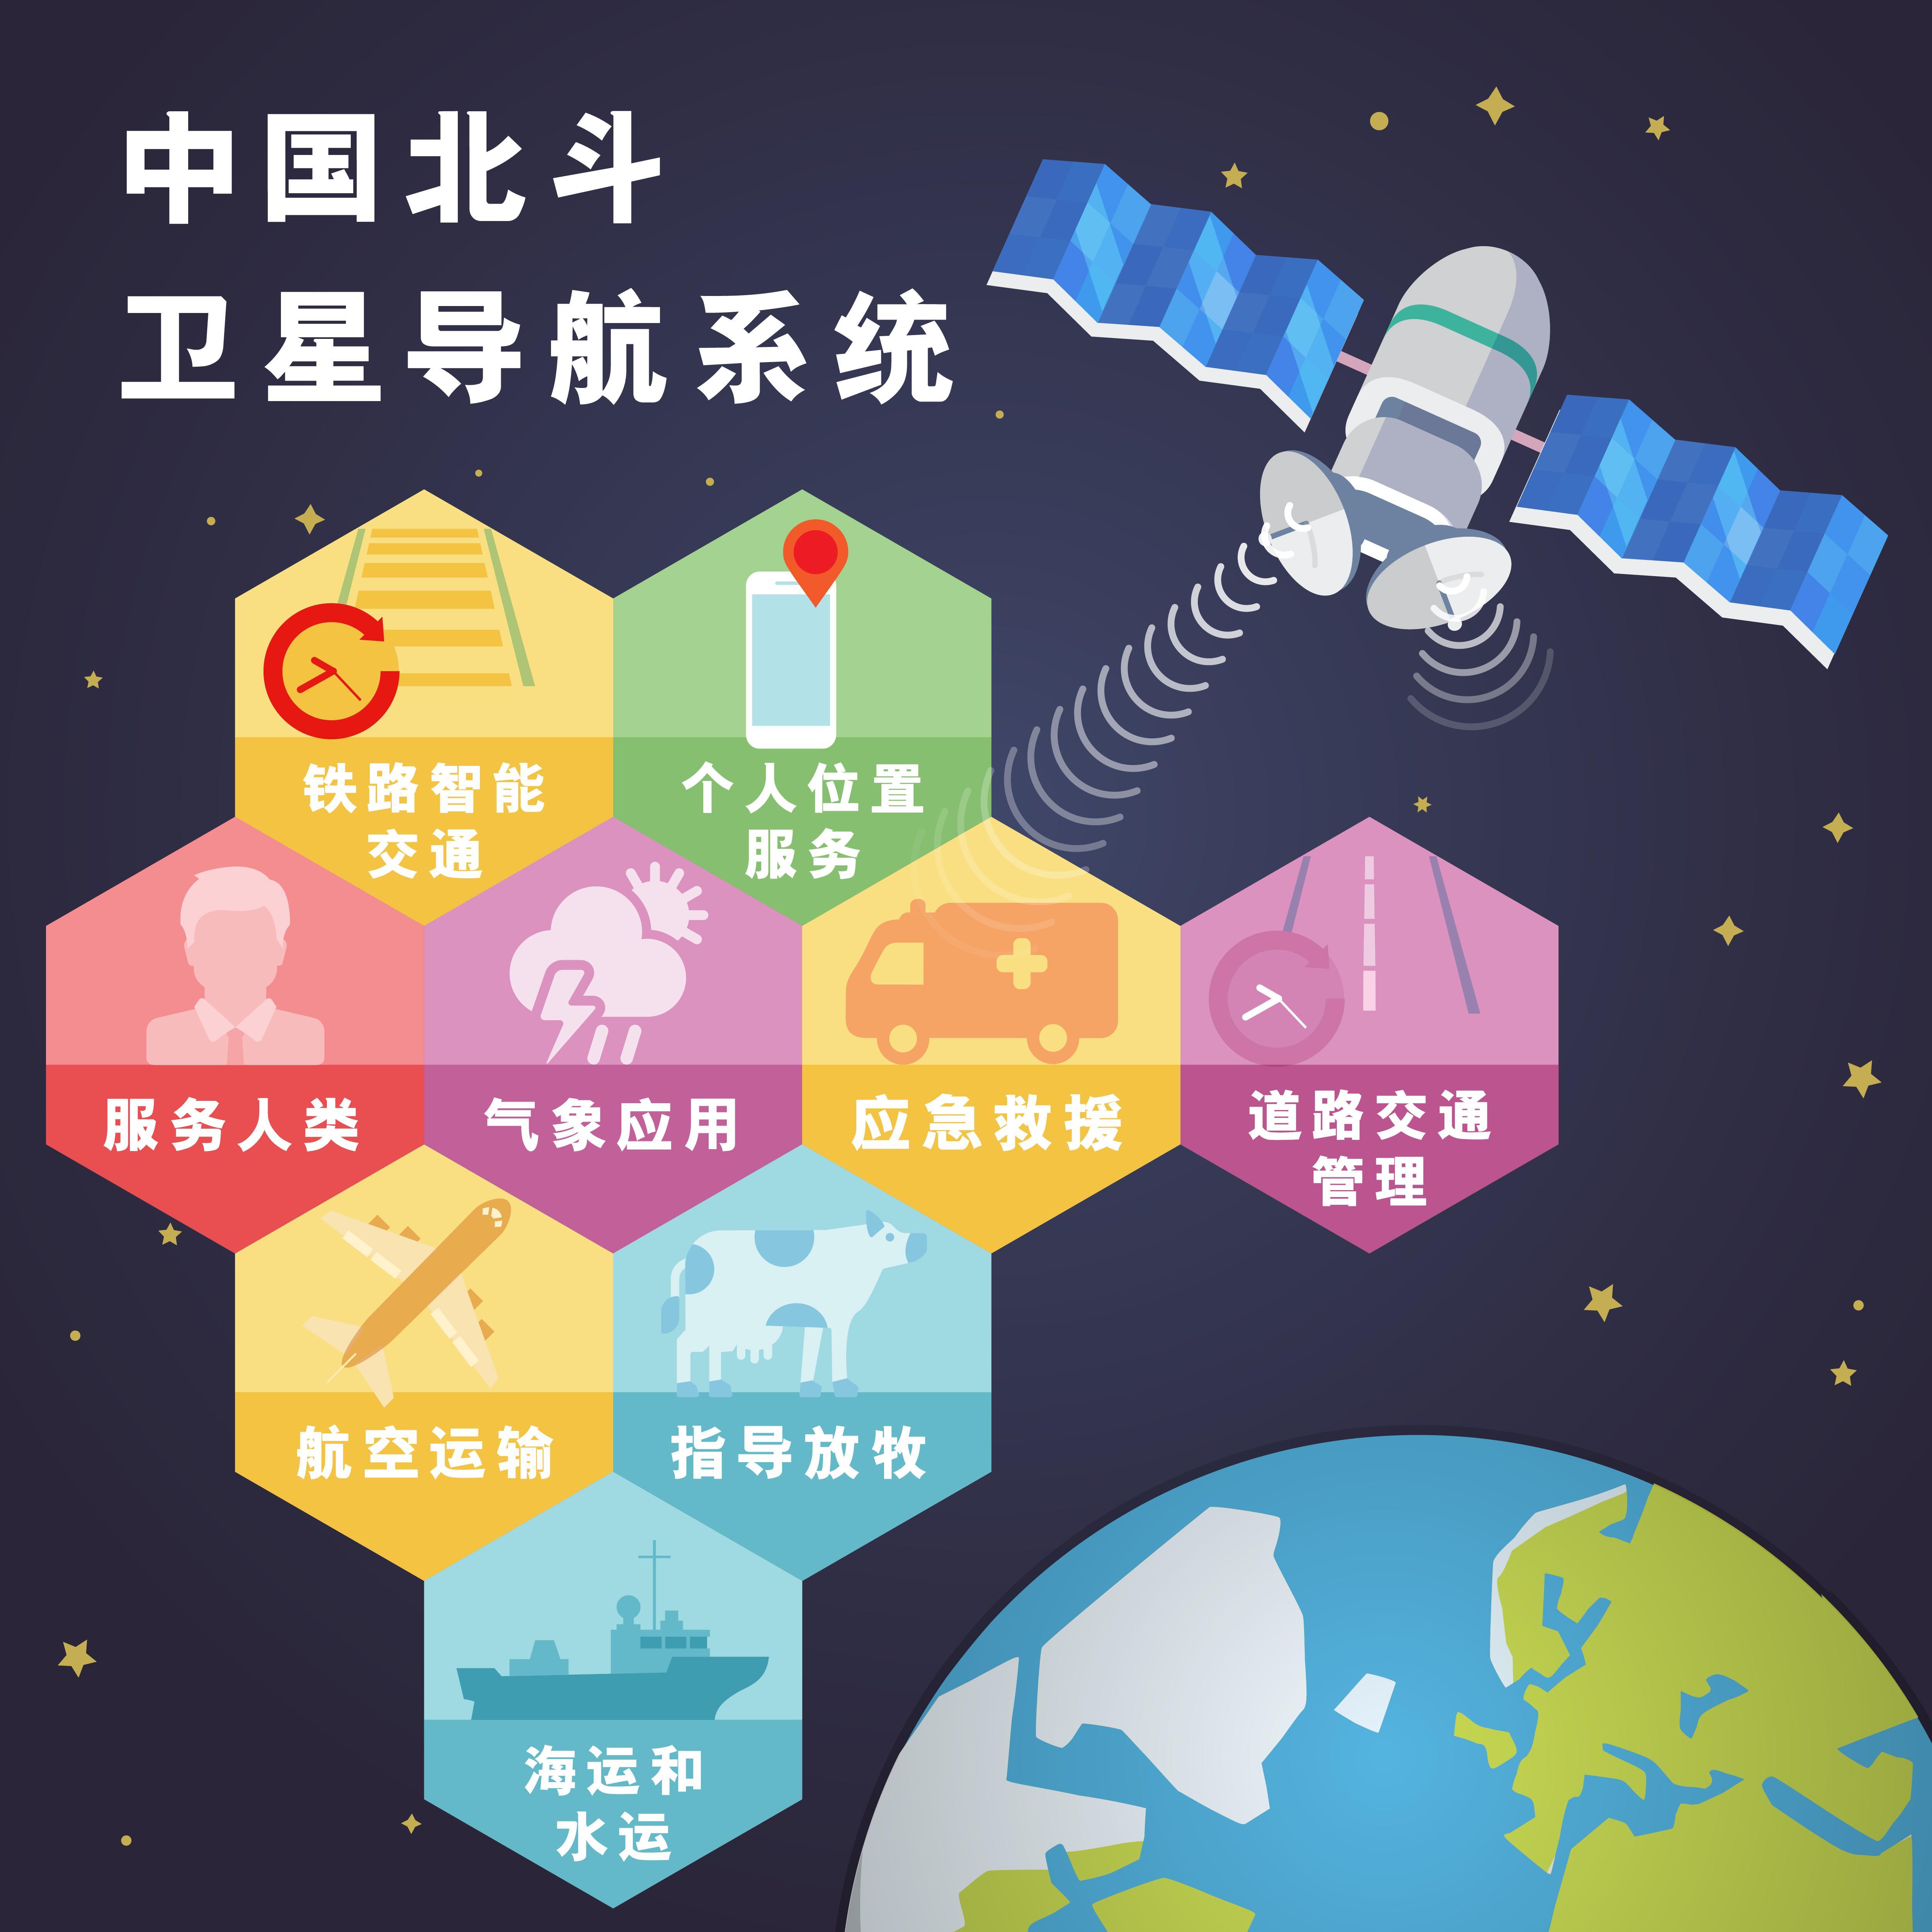 main_site_illustration_beidouweixing_v5_1